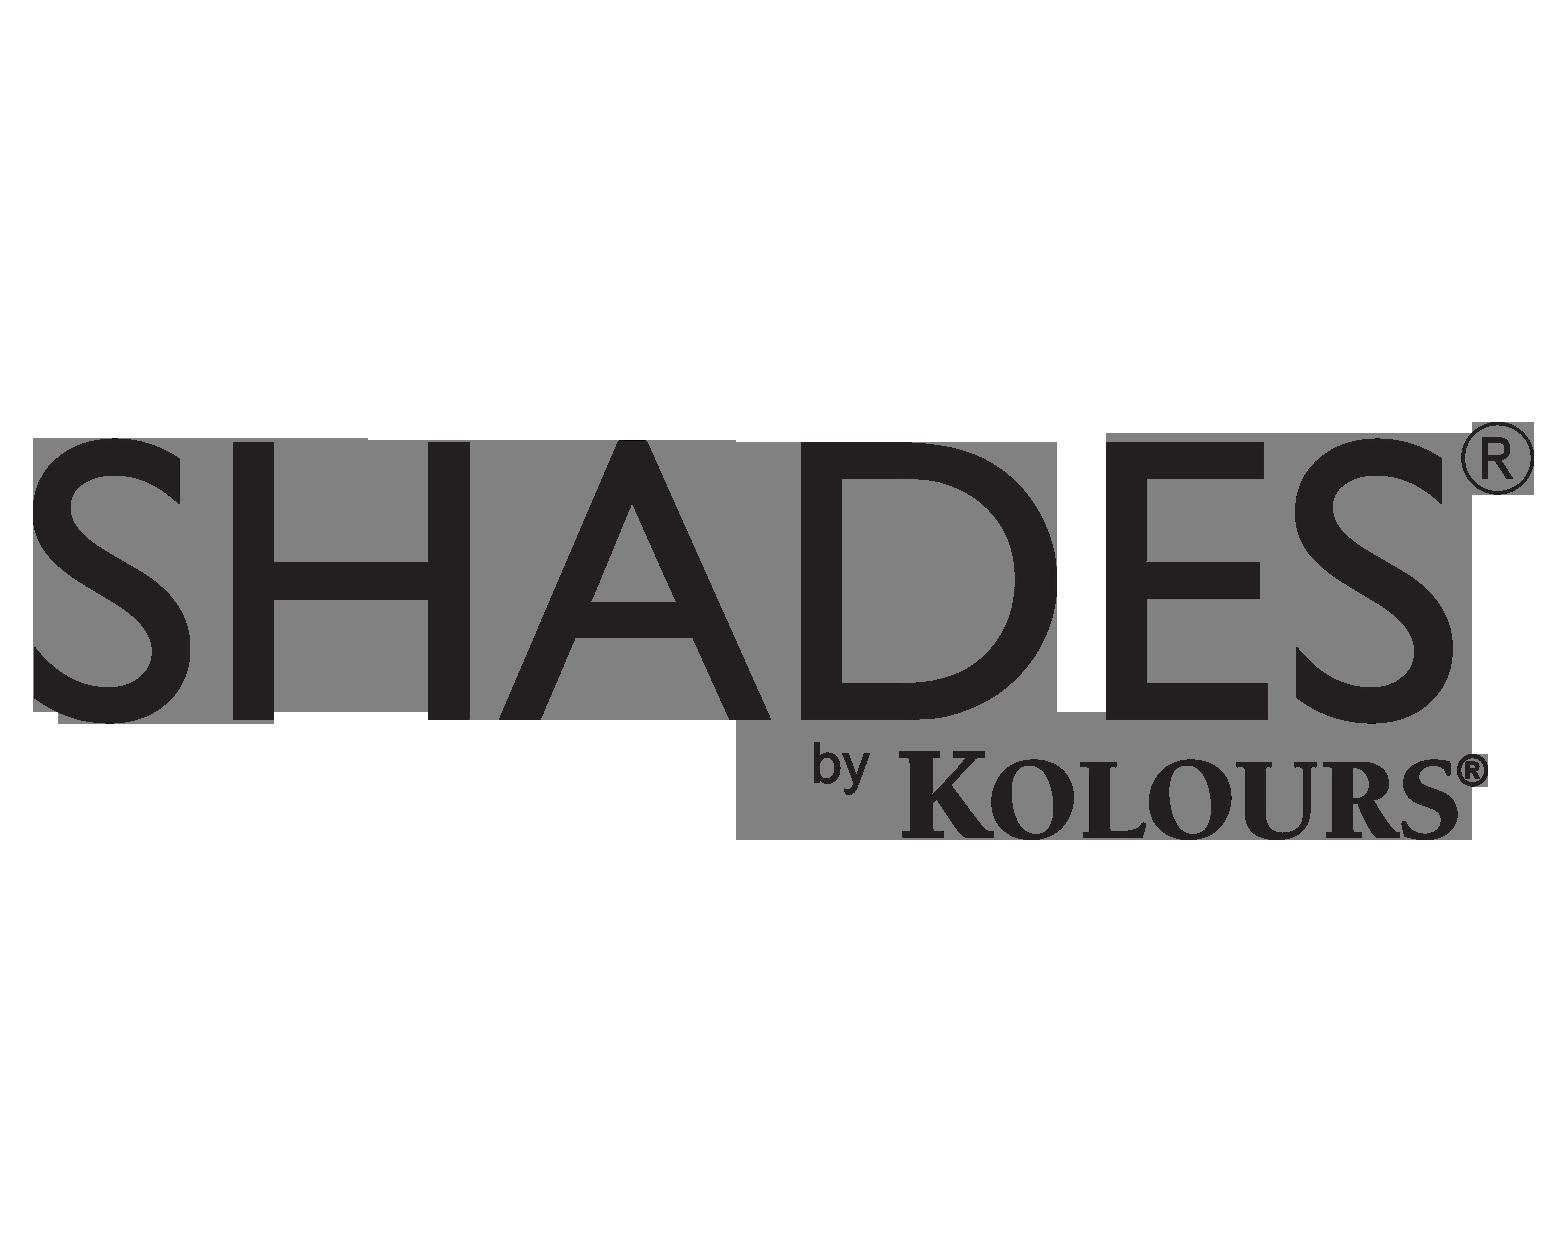 Shades by Kolours